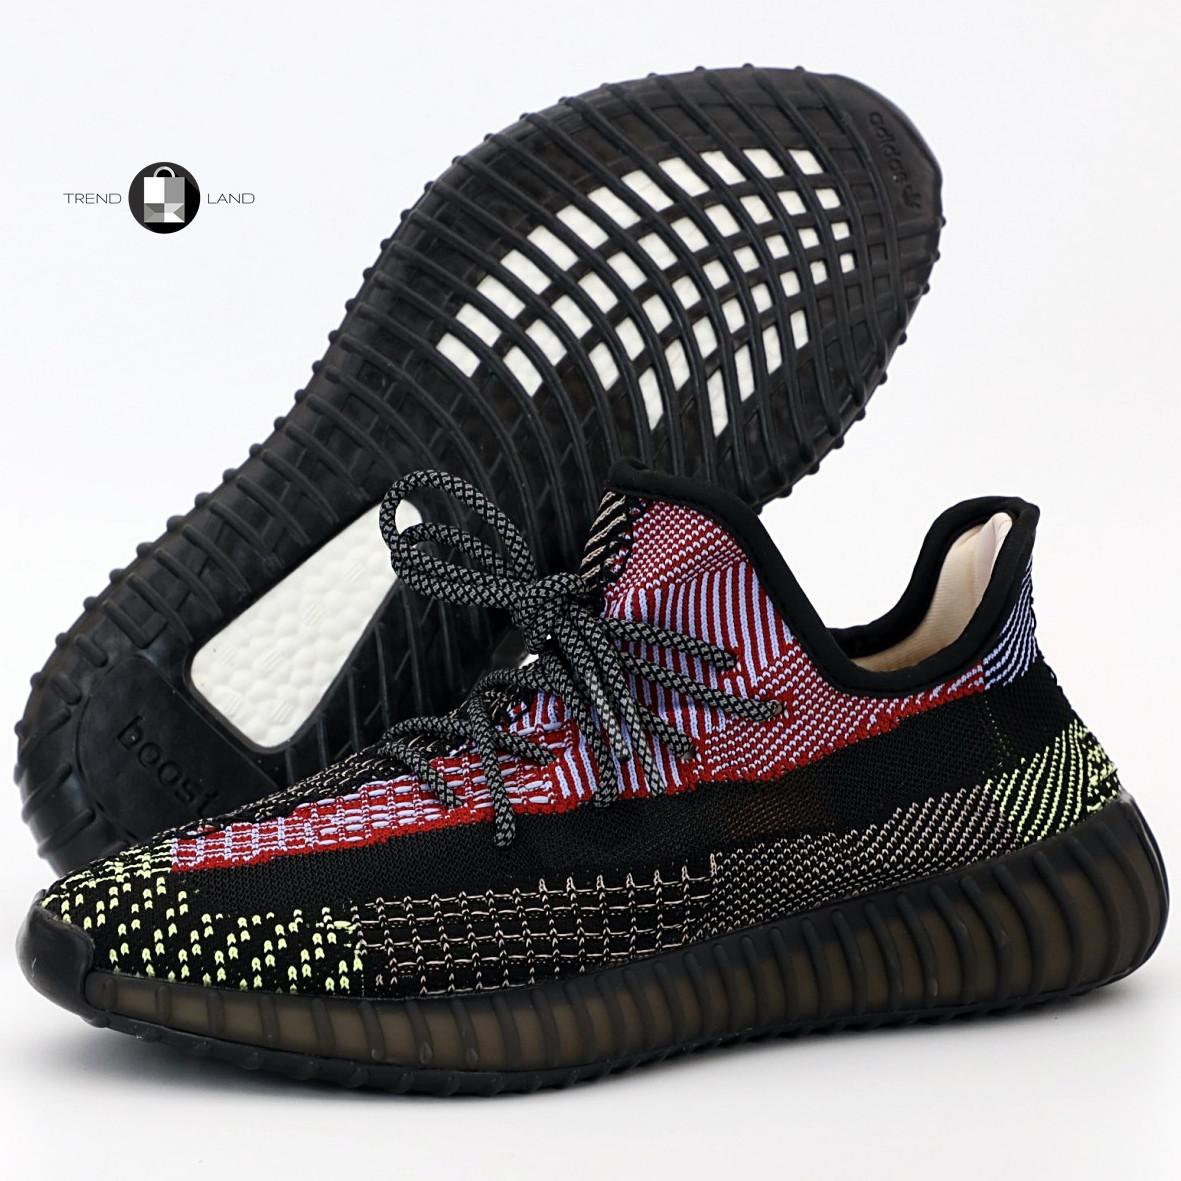 Рефлектив   Жіночі кросівки в стилі Adidas Yeezy Boost 350 v2 Red Black Reflective